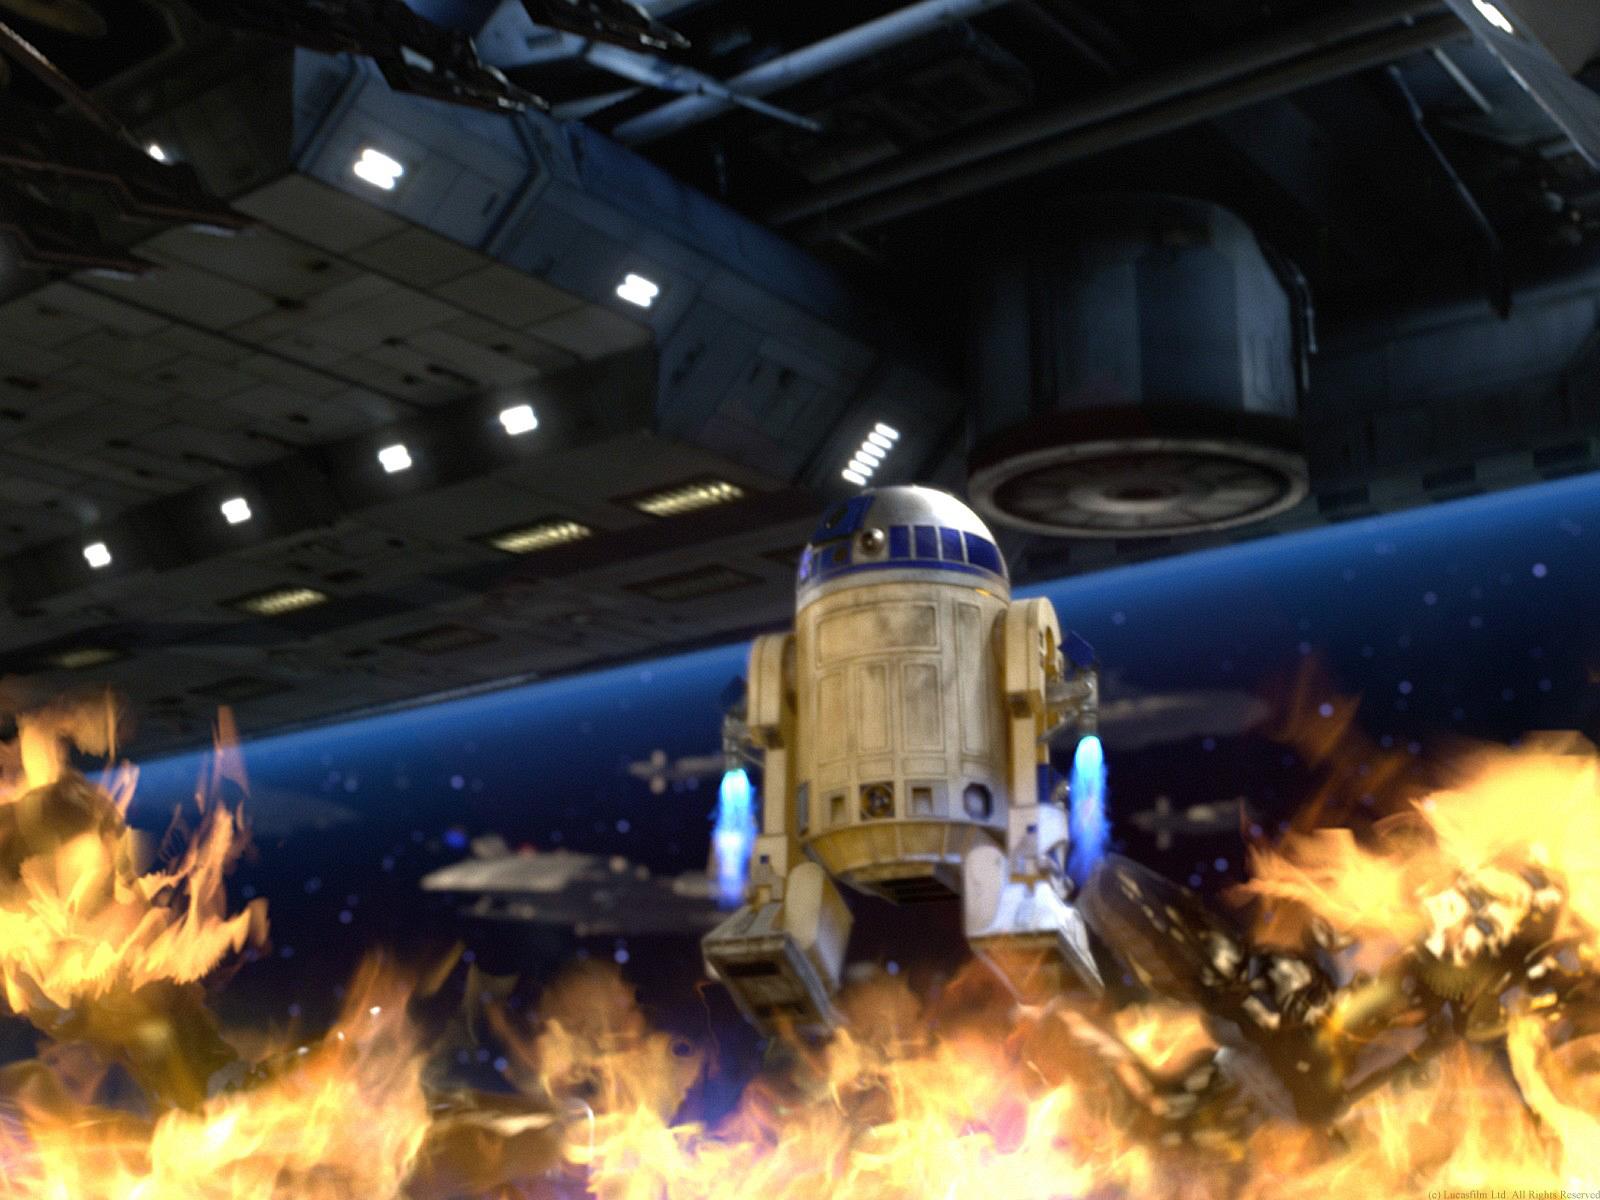 Tiedosto:R2 flames.jpg